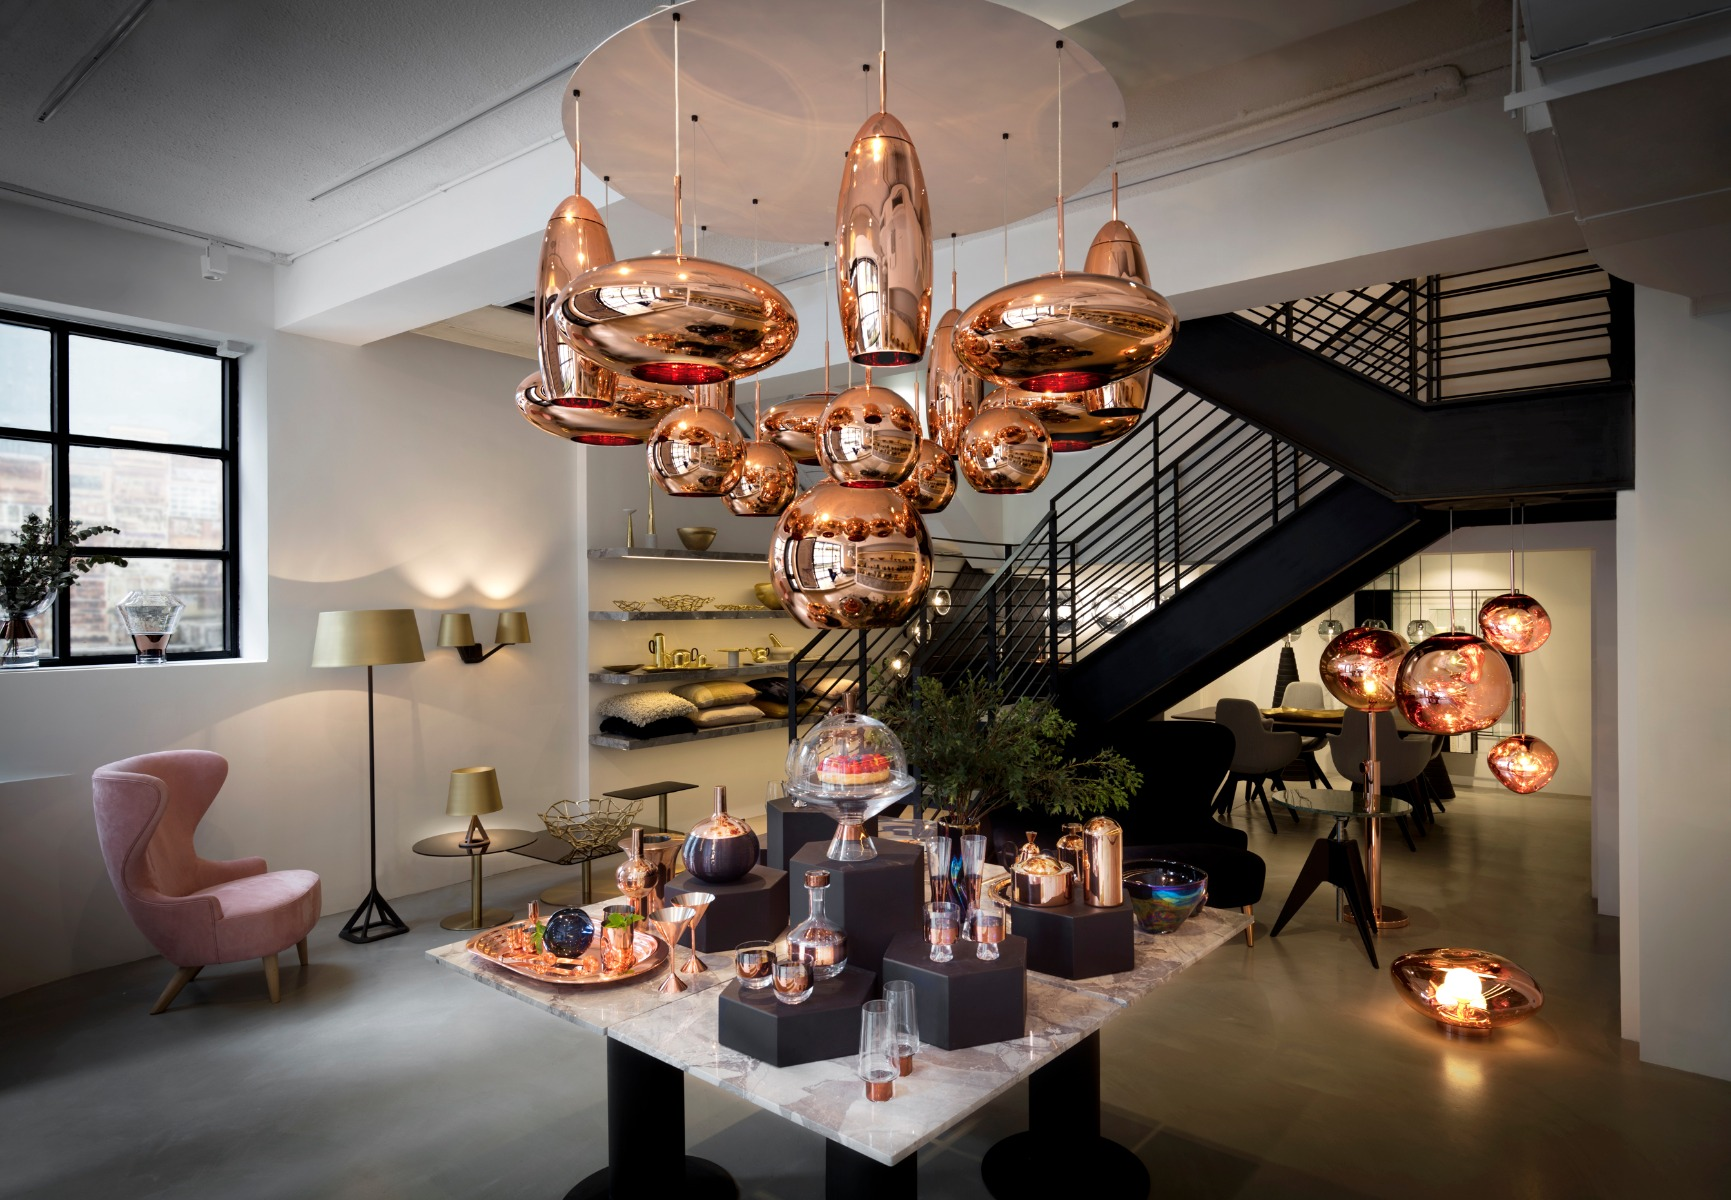 copper pendant light kitchen free standing sink unit hong kong shop opens